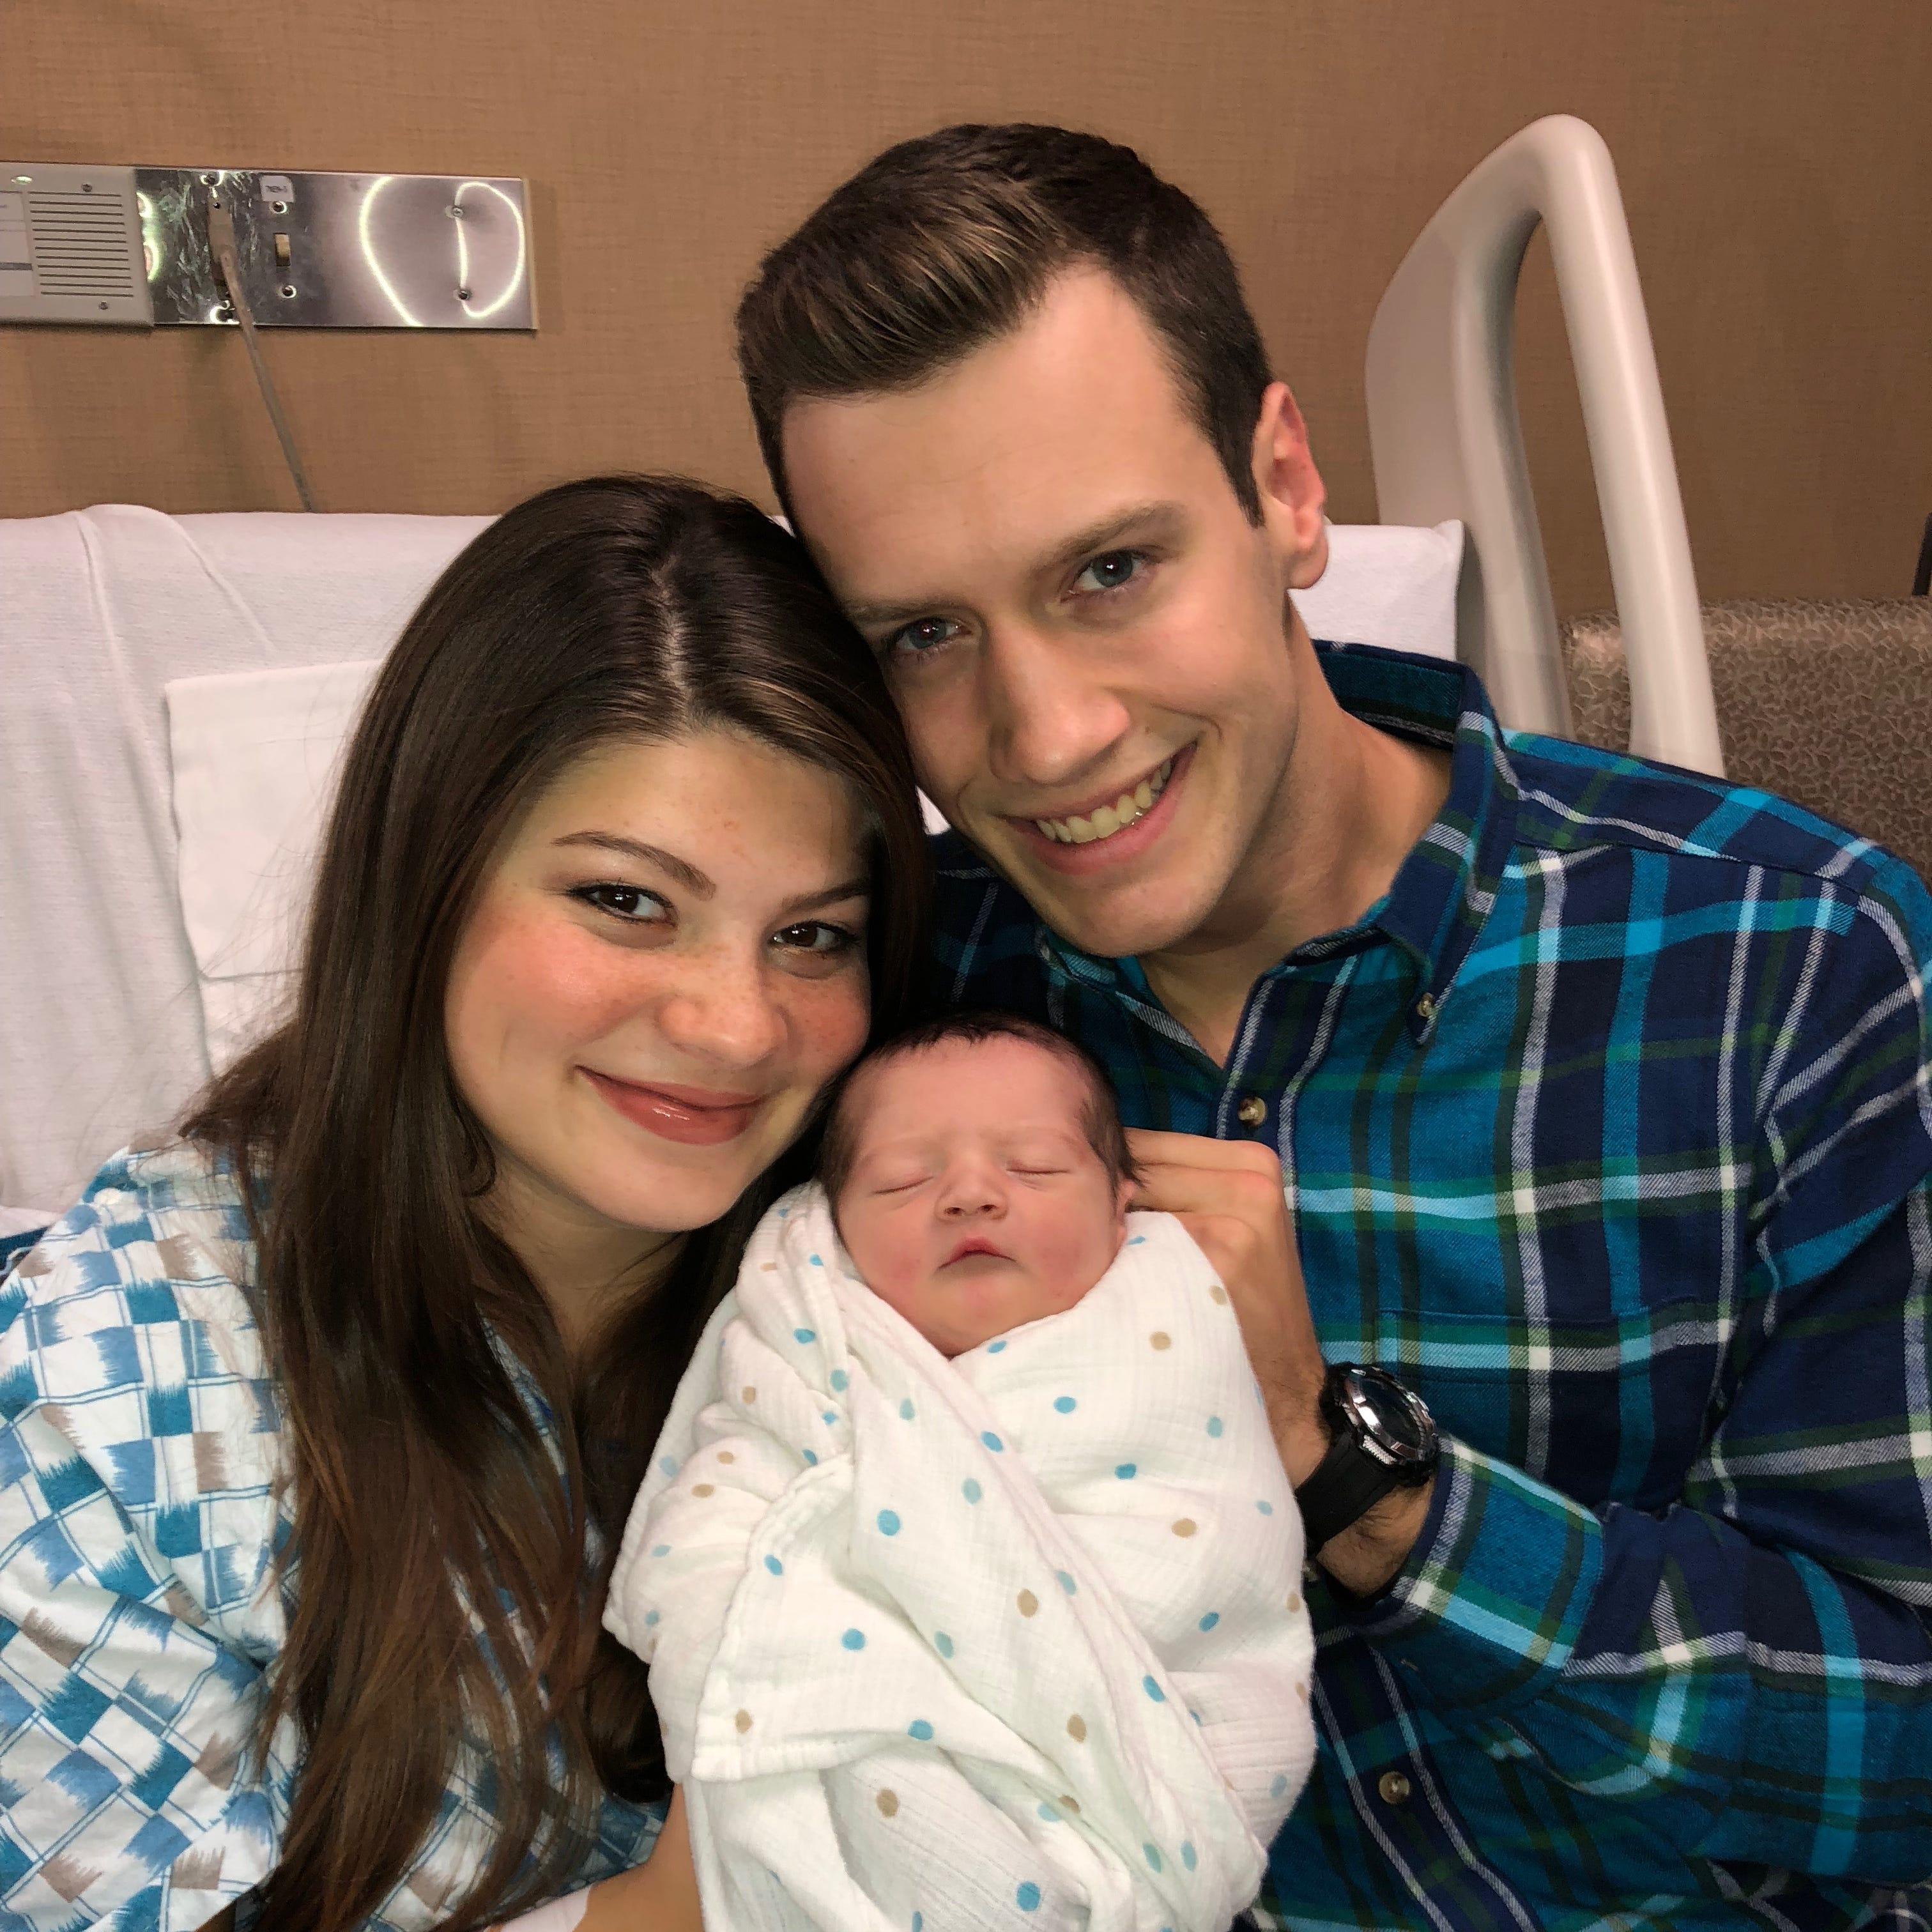 'Bringing Up Bates' stars Tori, Bobby Smith welcome newborn son Kade at Nashville hospital